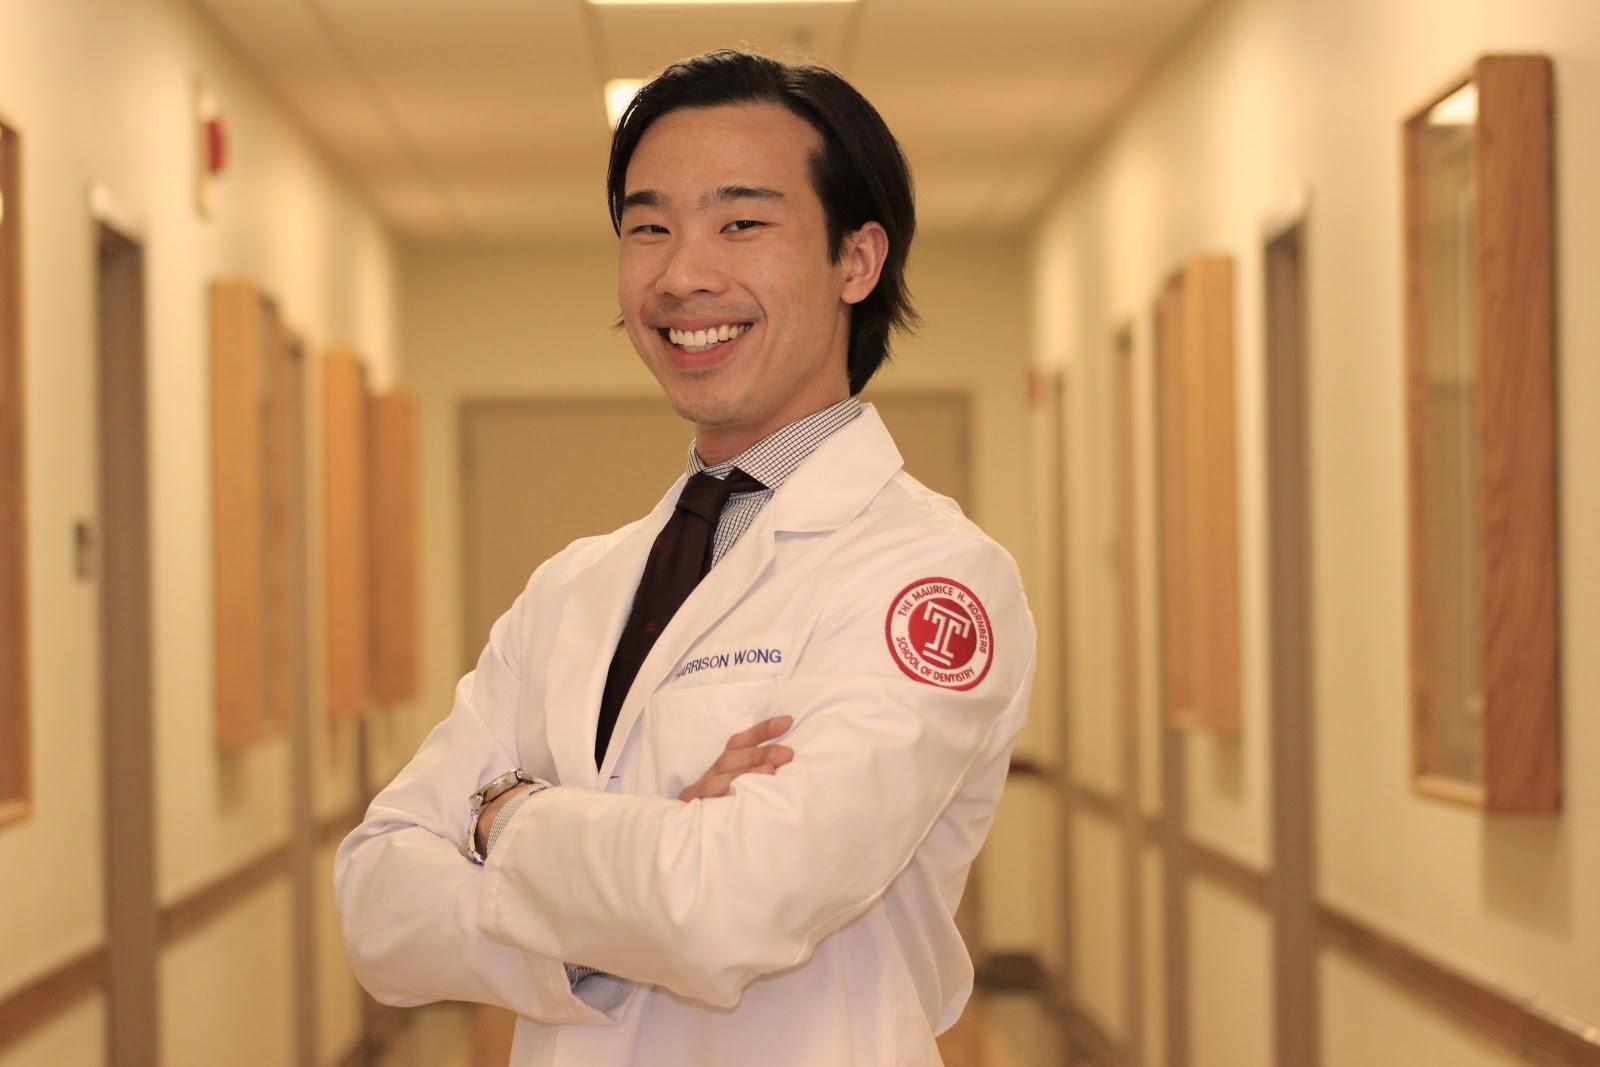 Dr. Harrison Wong